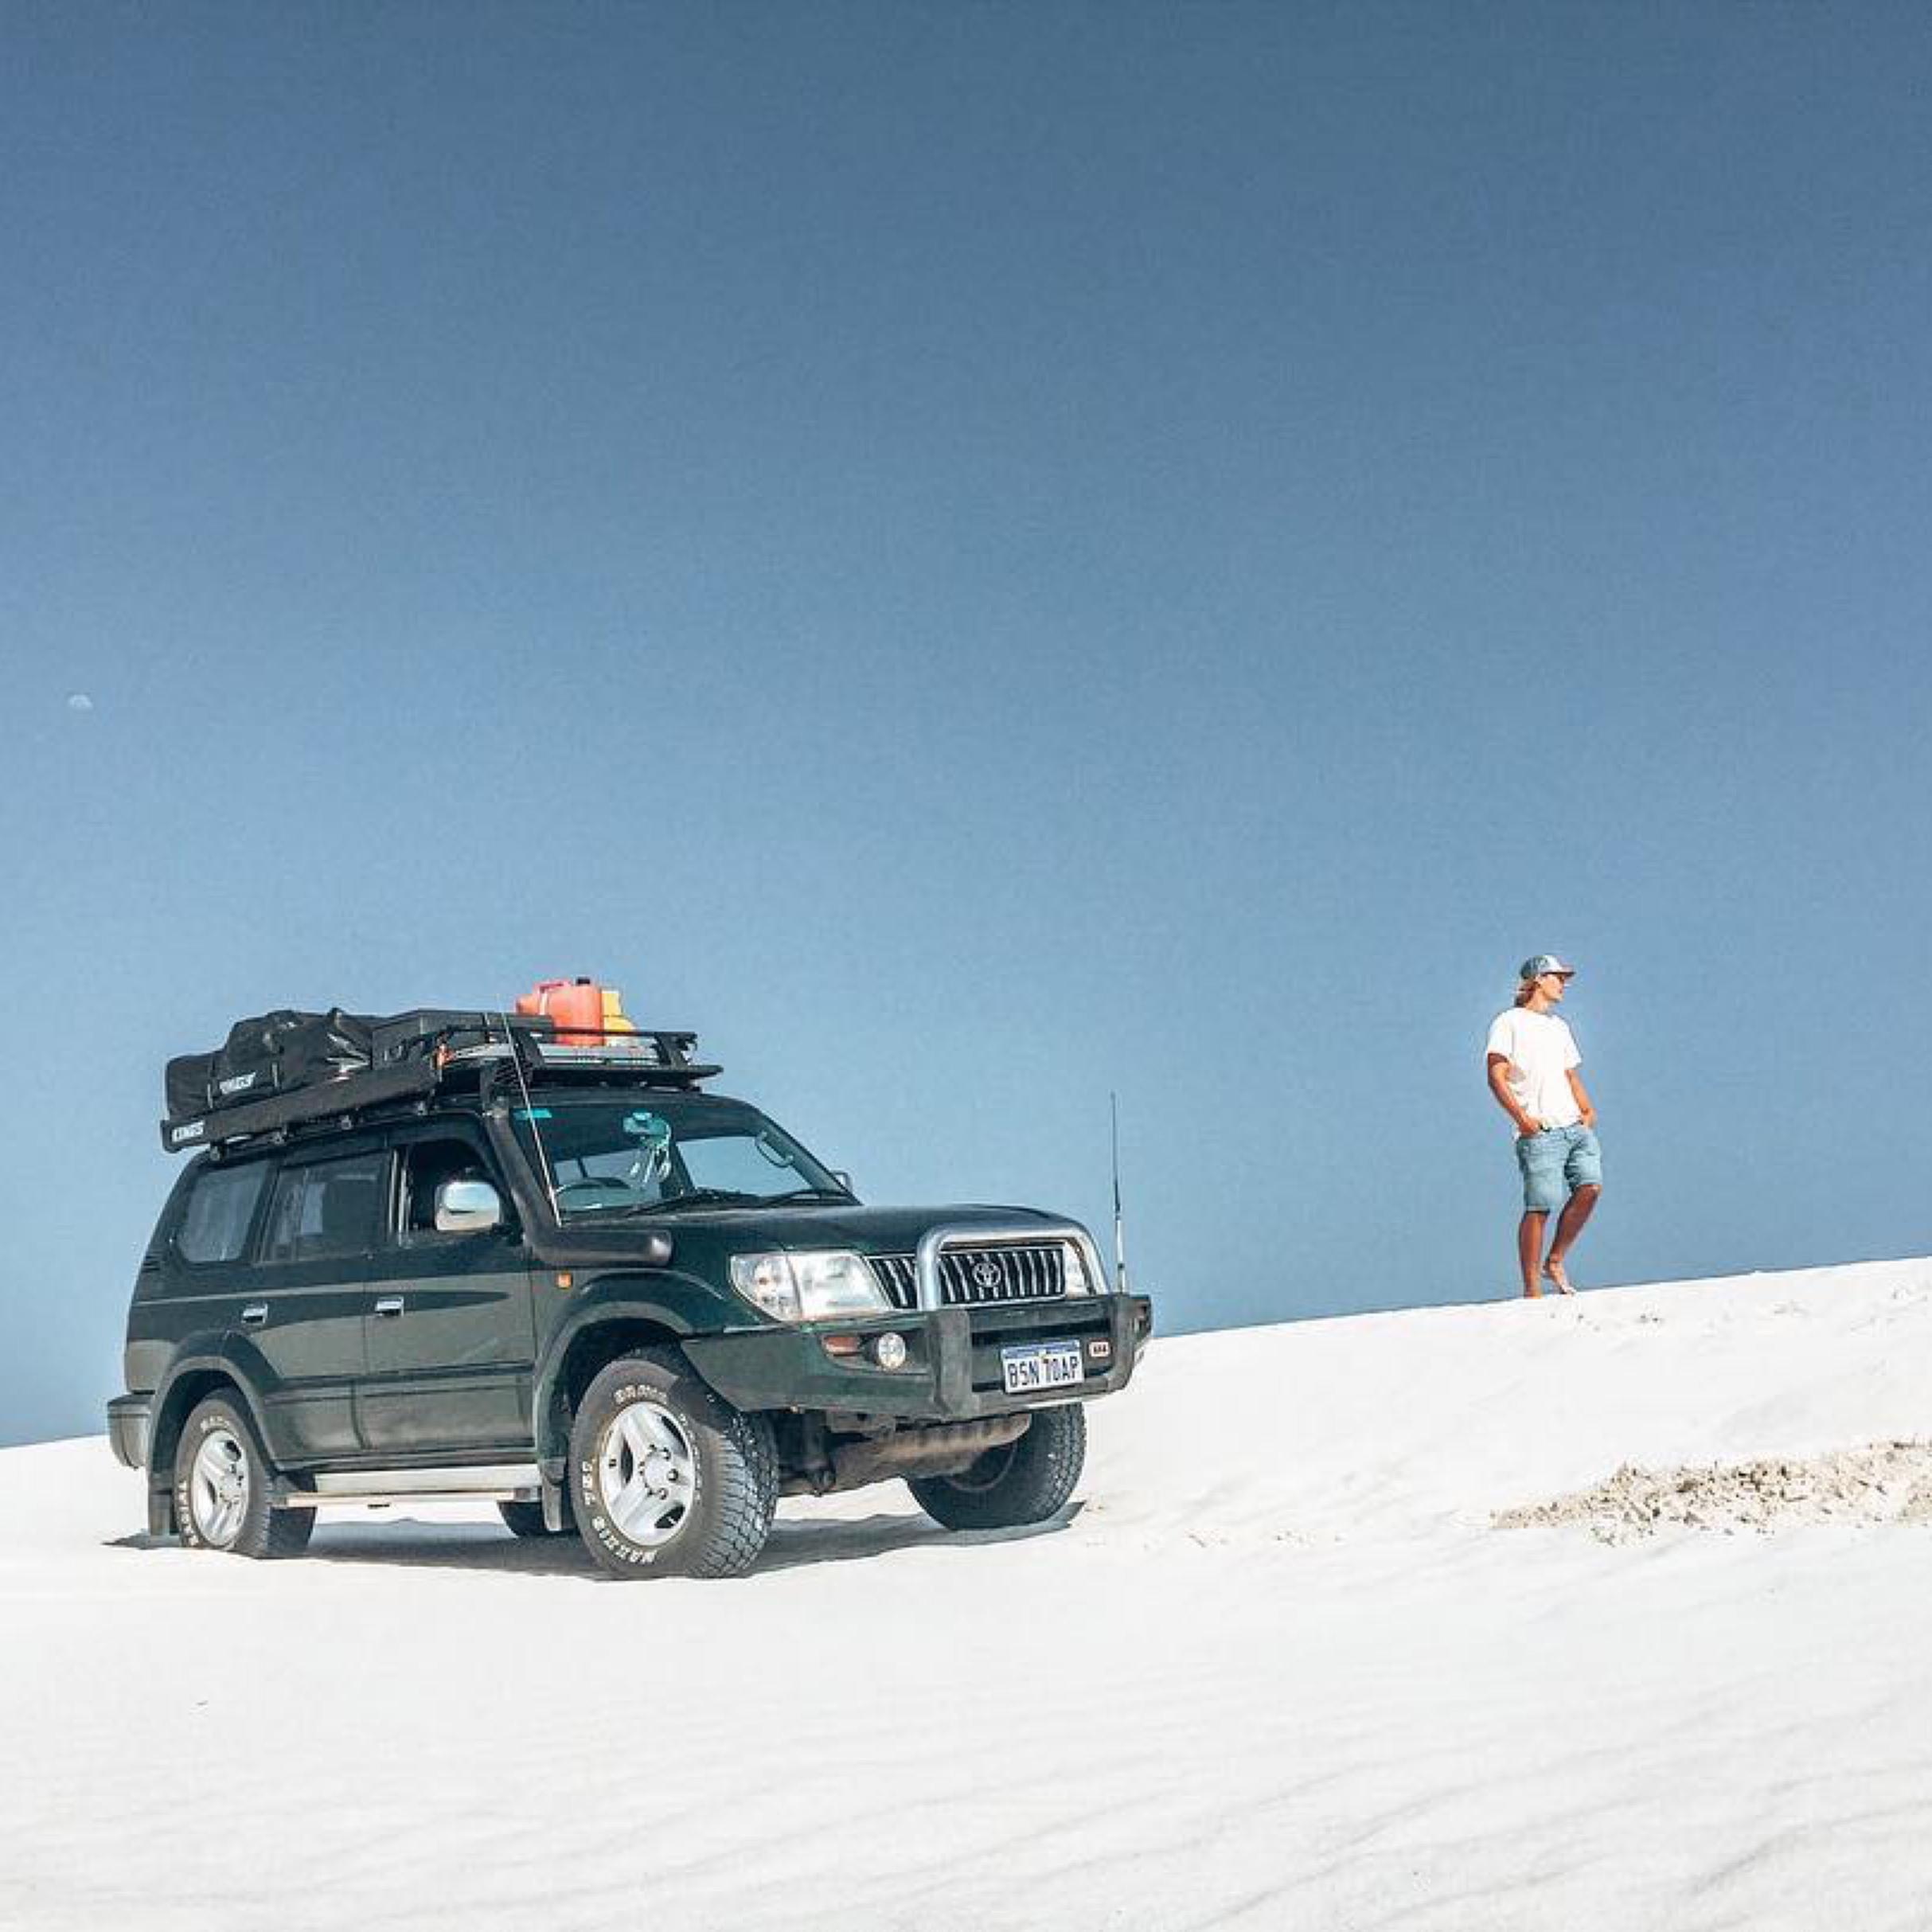 Wylie Bay Dunes (Credit: Nikki Noorman)